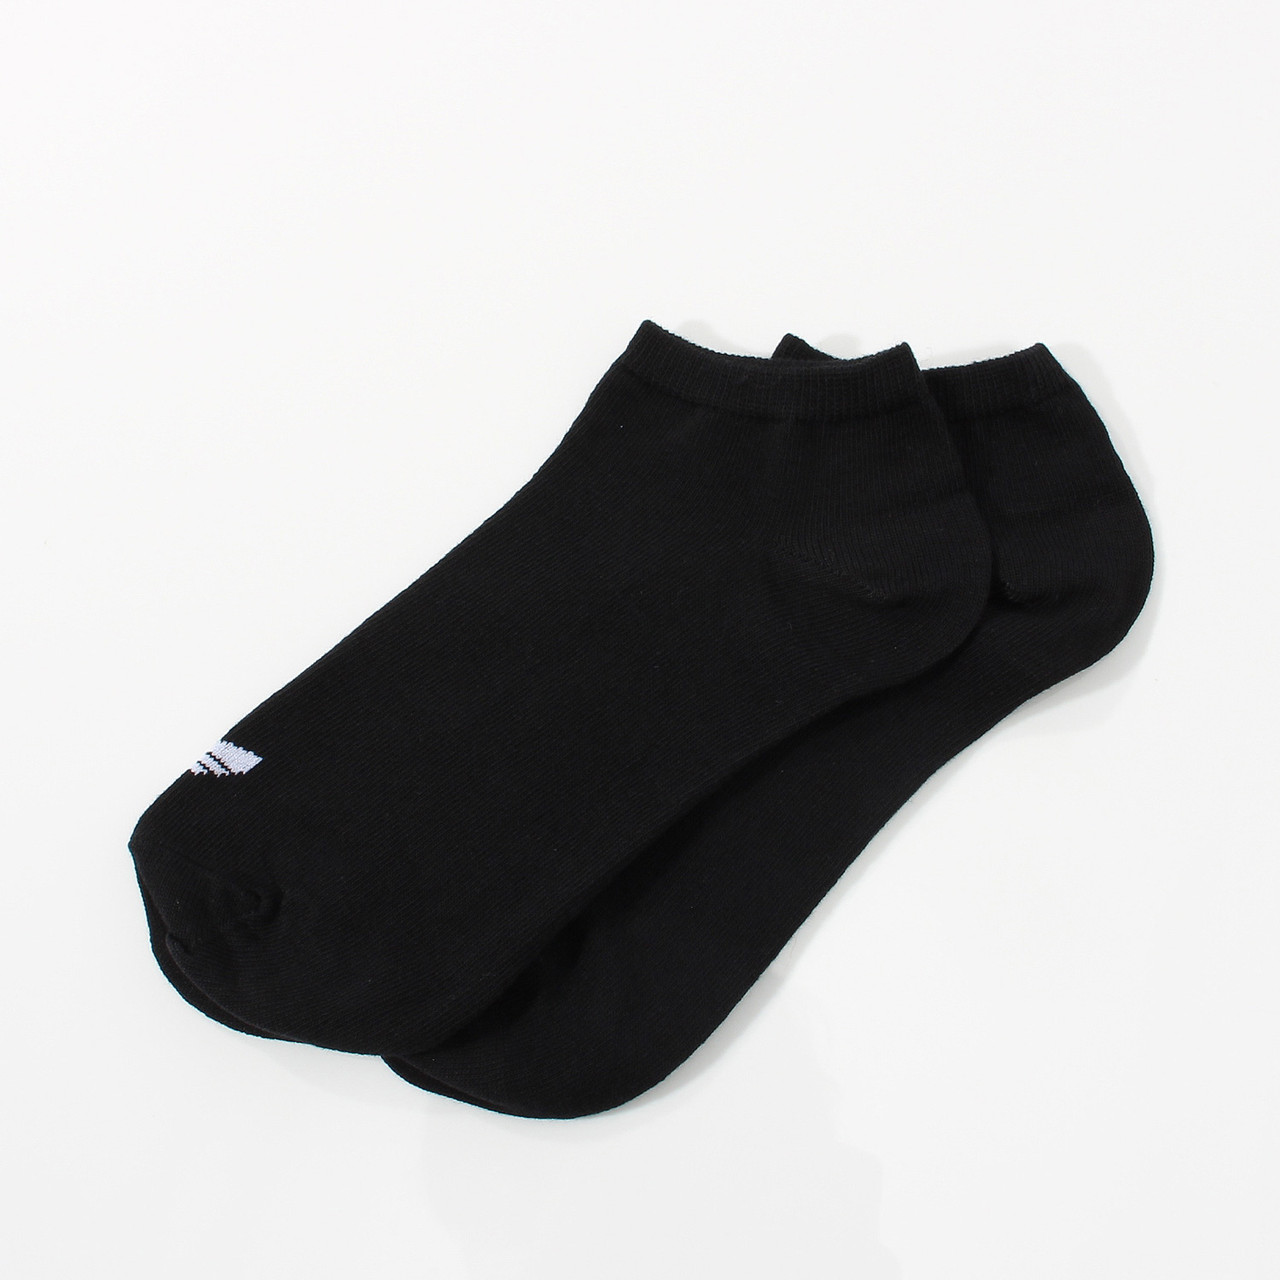 Носки Adidas Trefoil Liner (Артикул: S20274)